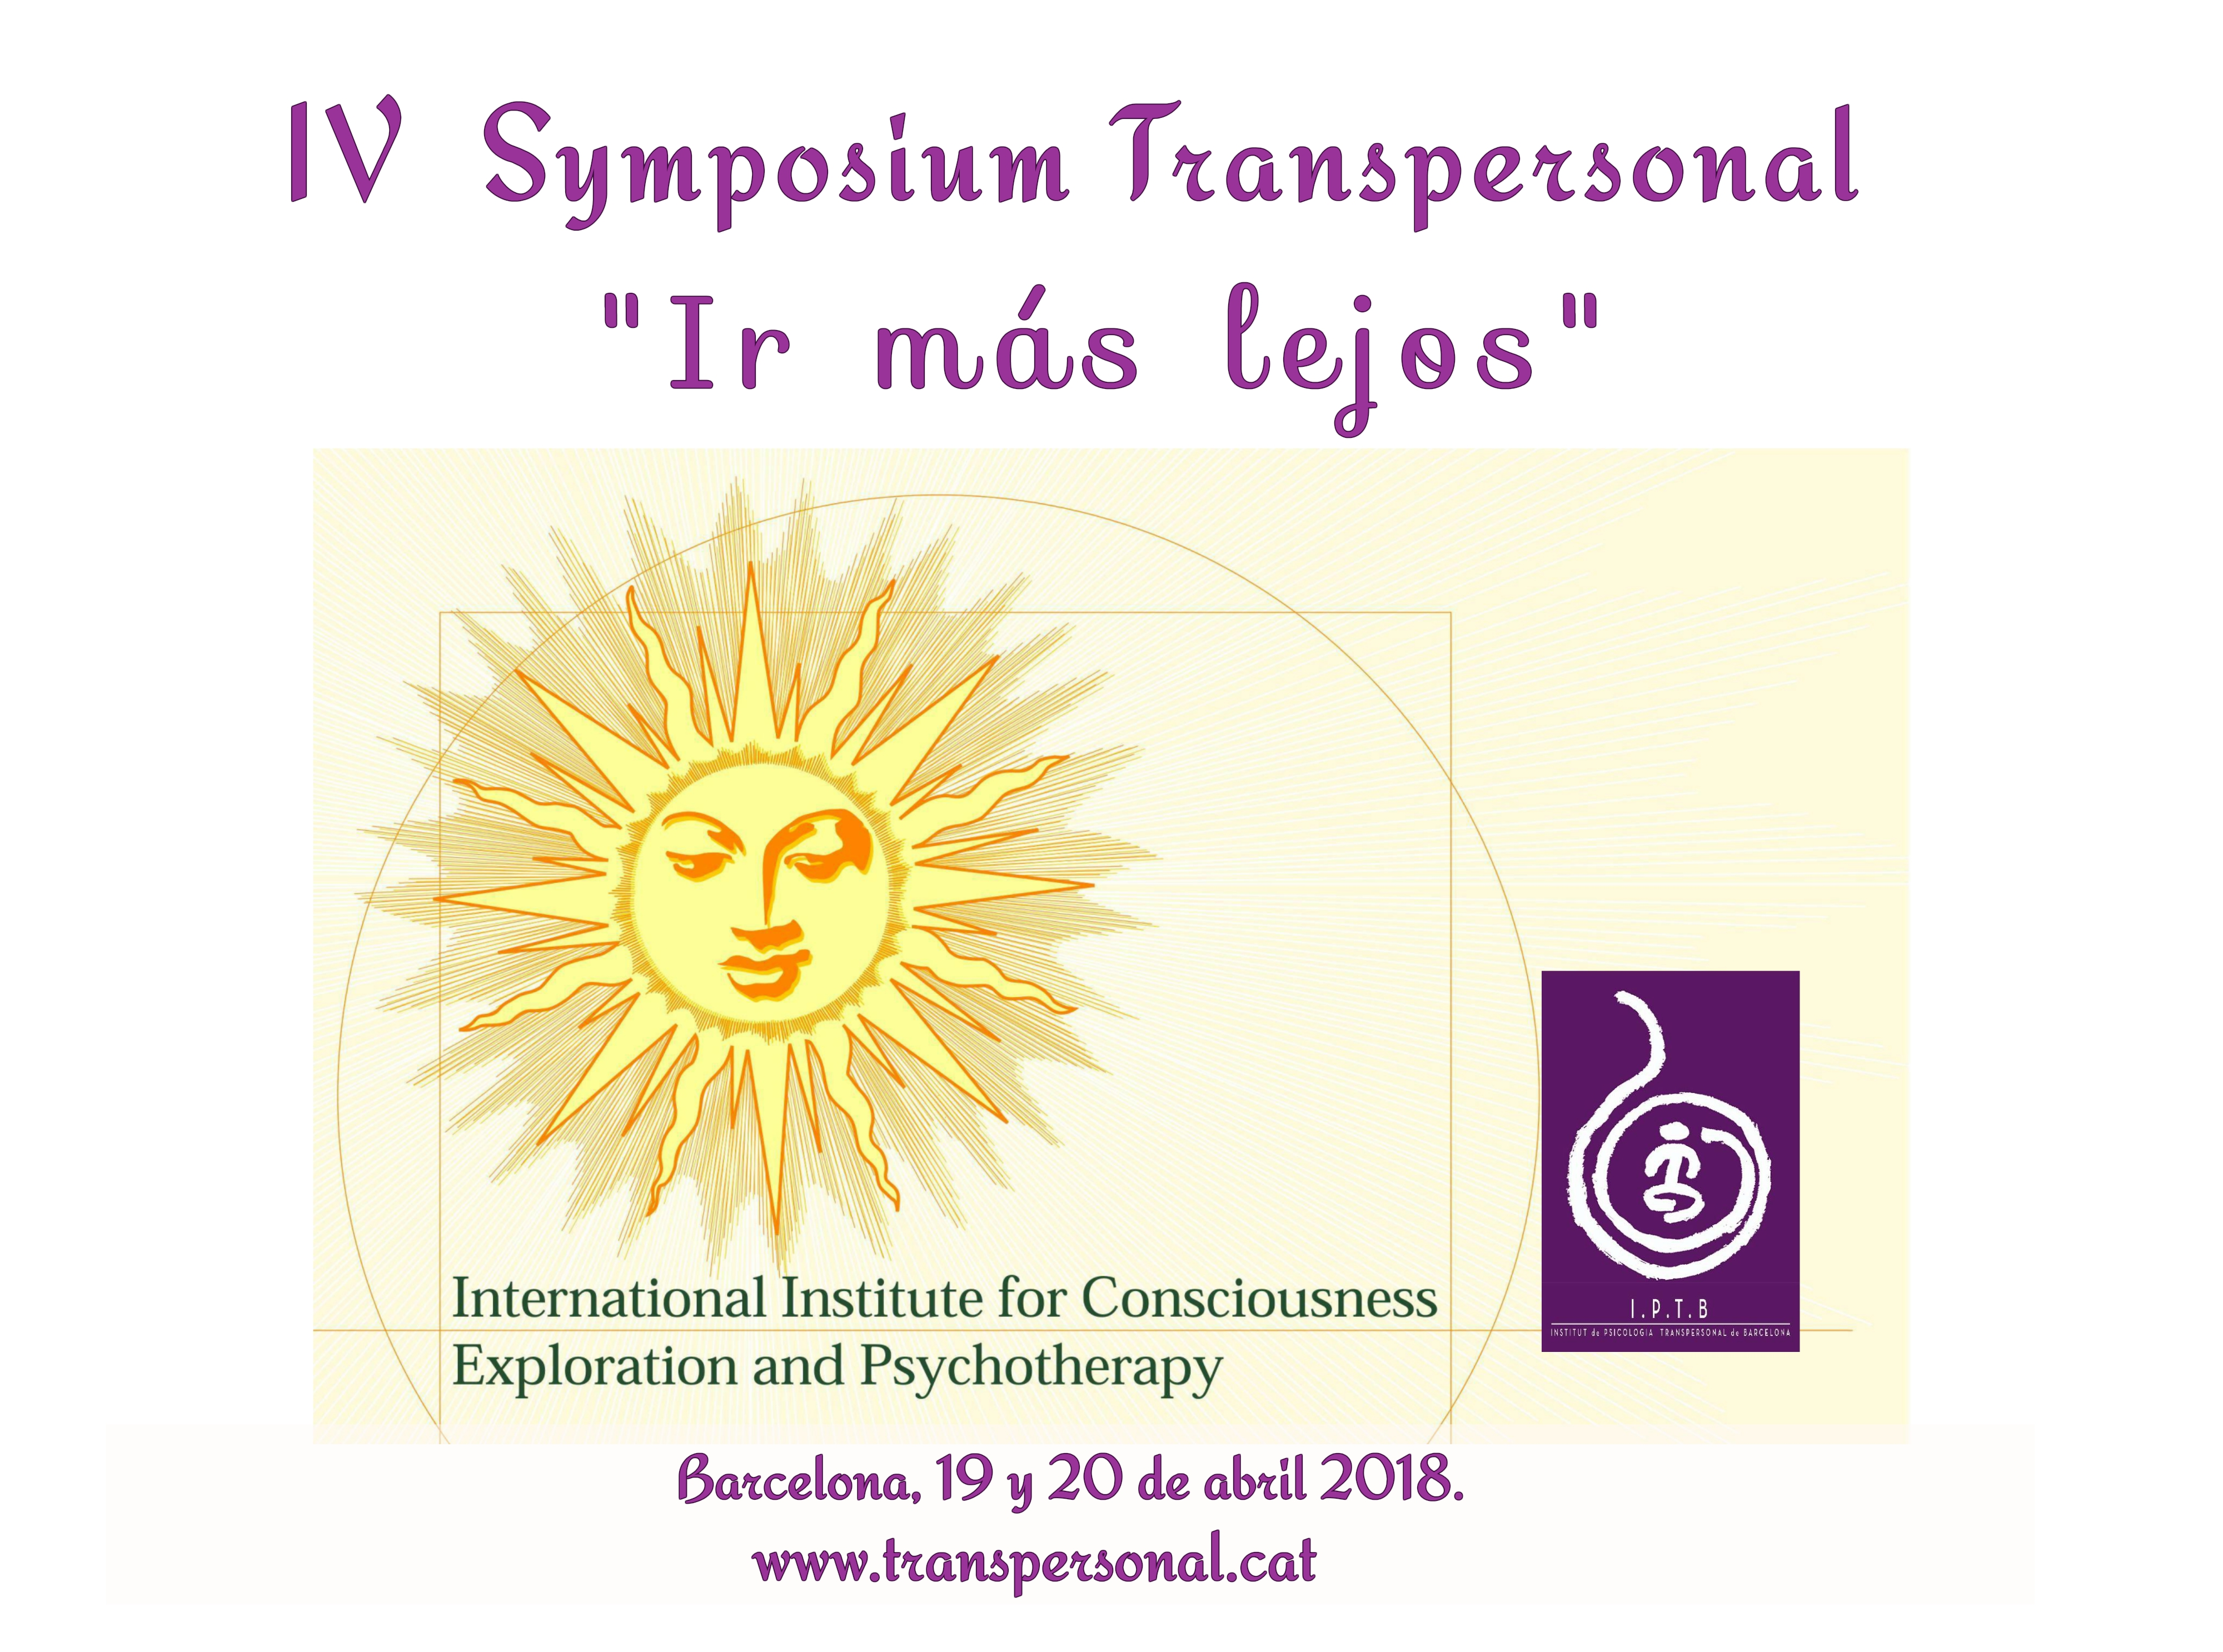 IV SYMPOSIUM TRANSPERSONAL